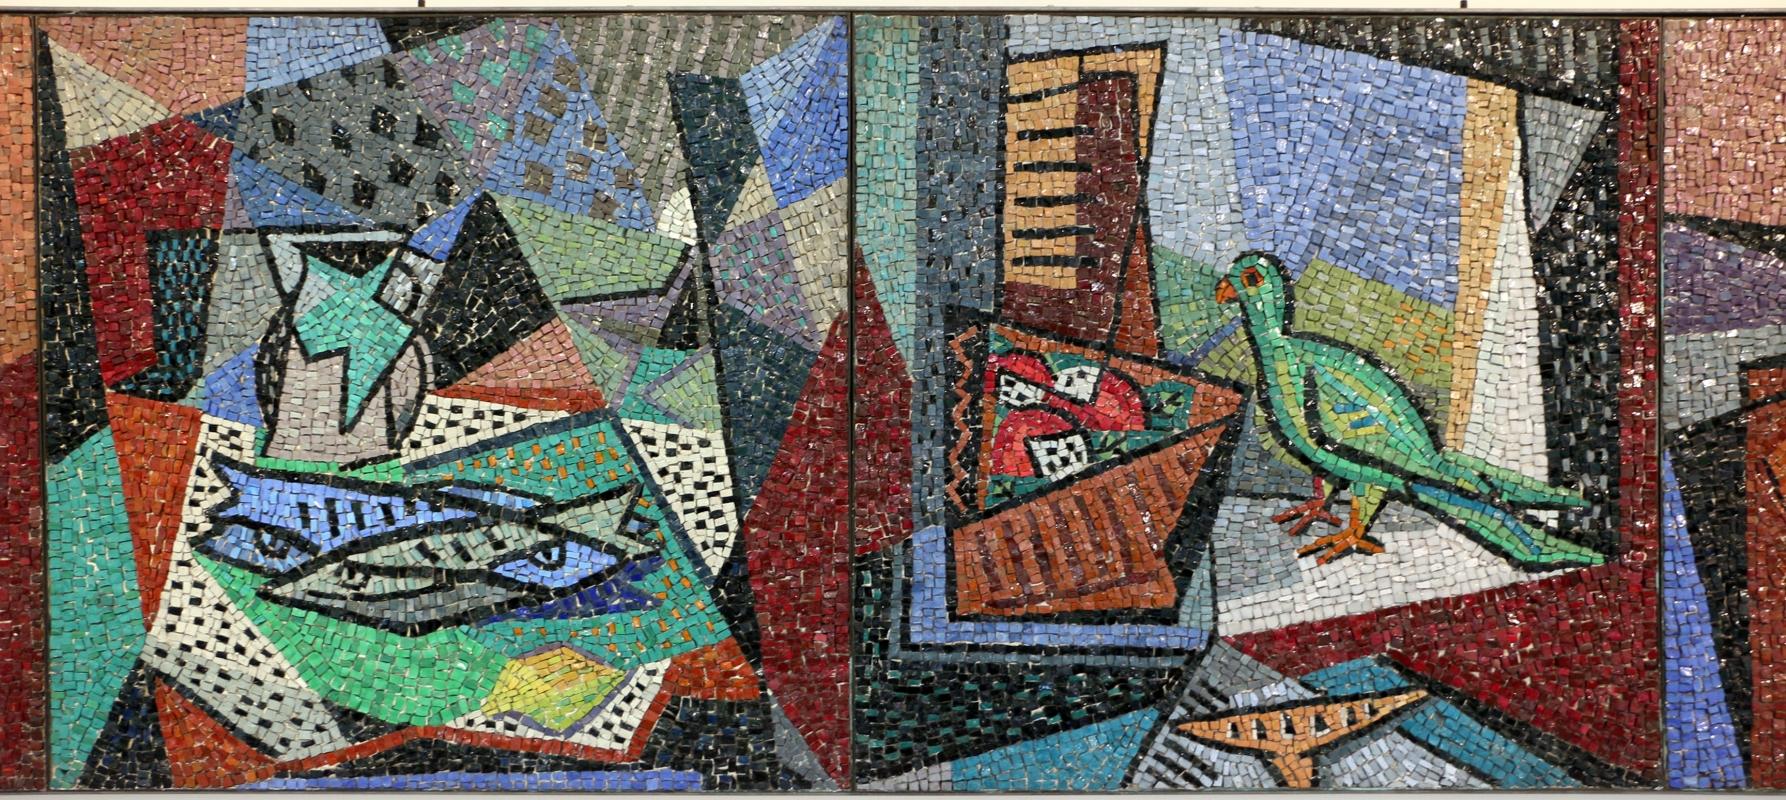 Lino melano, senza titolo, 1952, 04 - Sailko - Ravenna (RA)